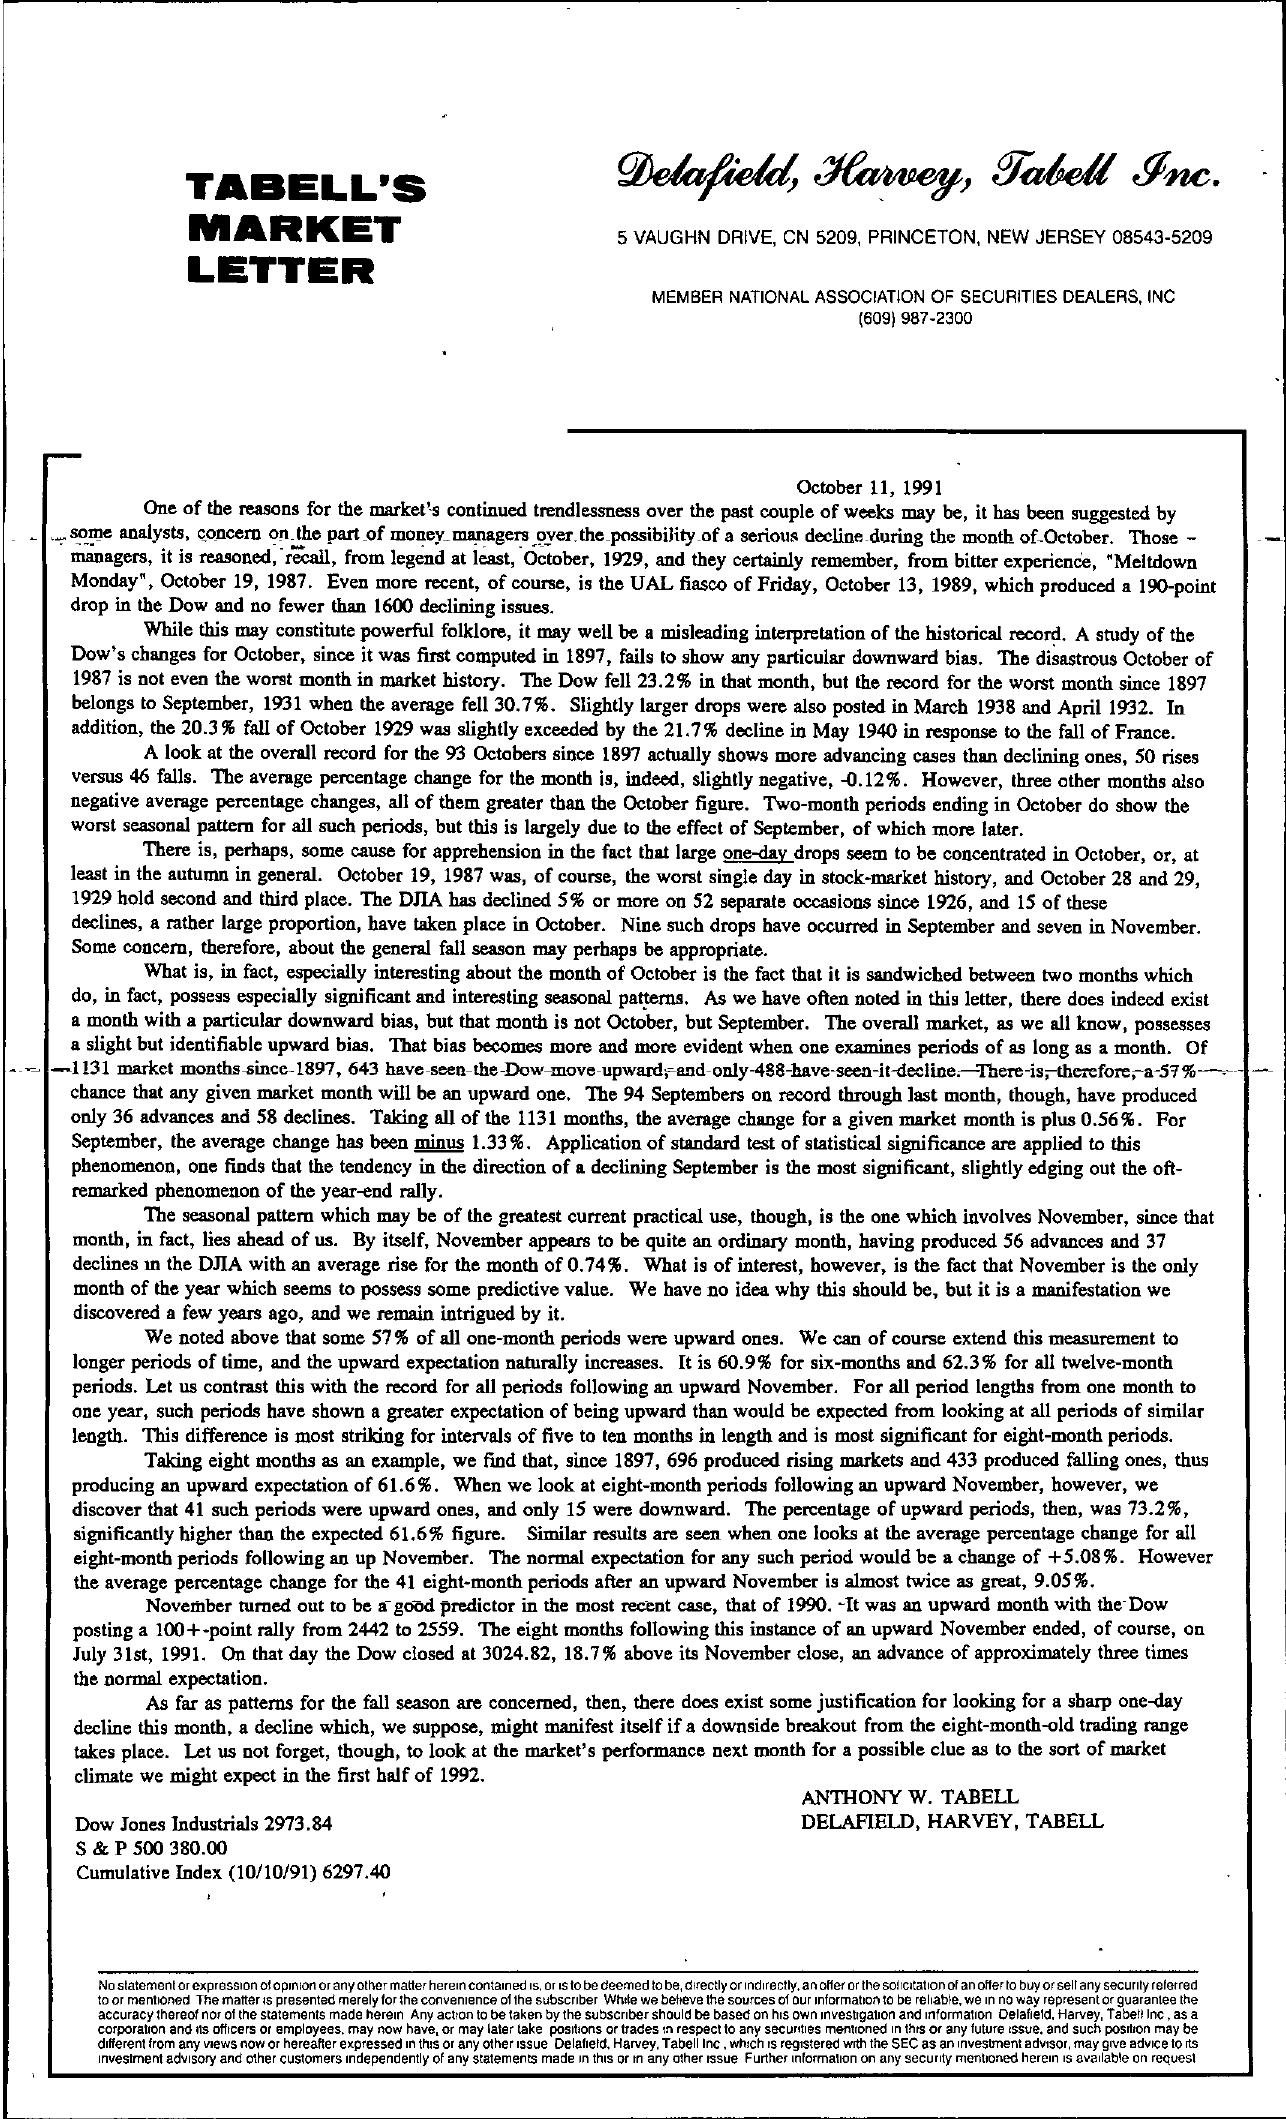 Tabell's Market Letter - October 11, 1991